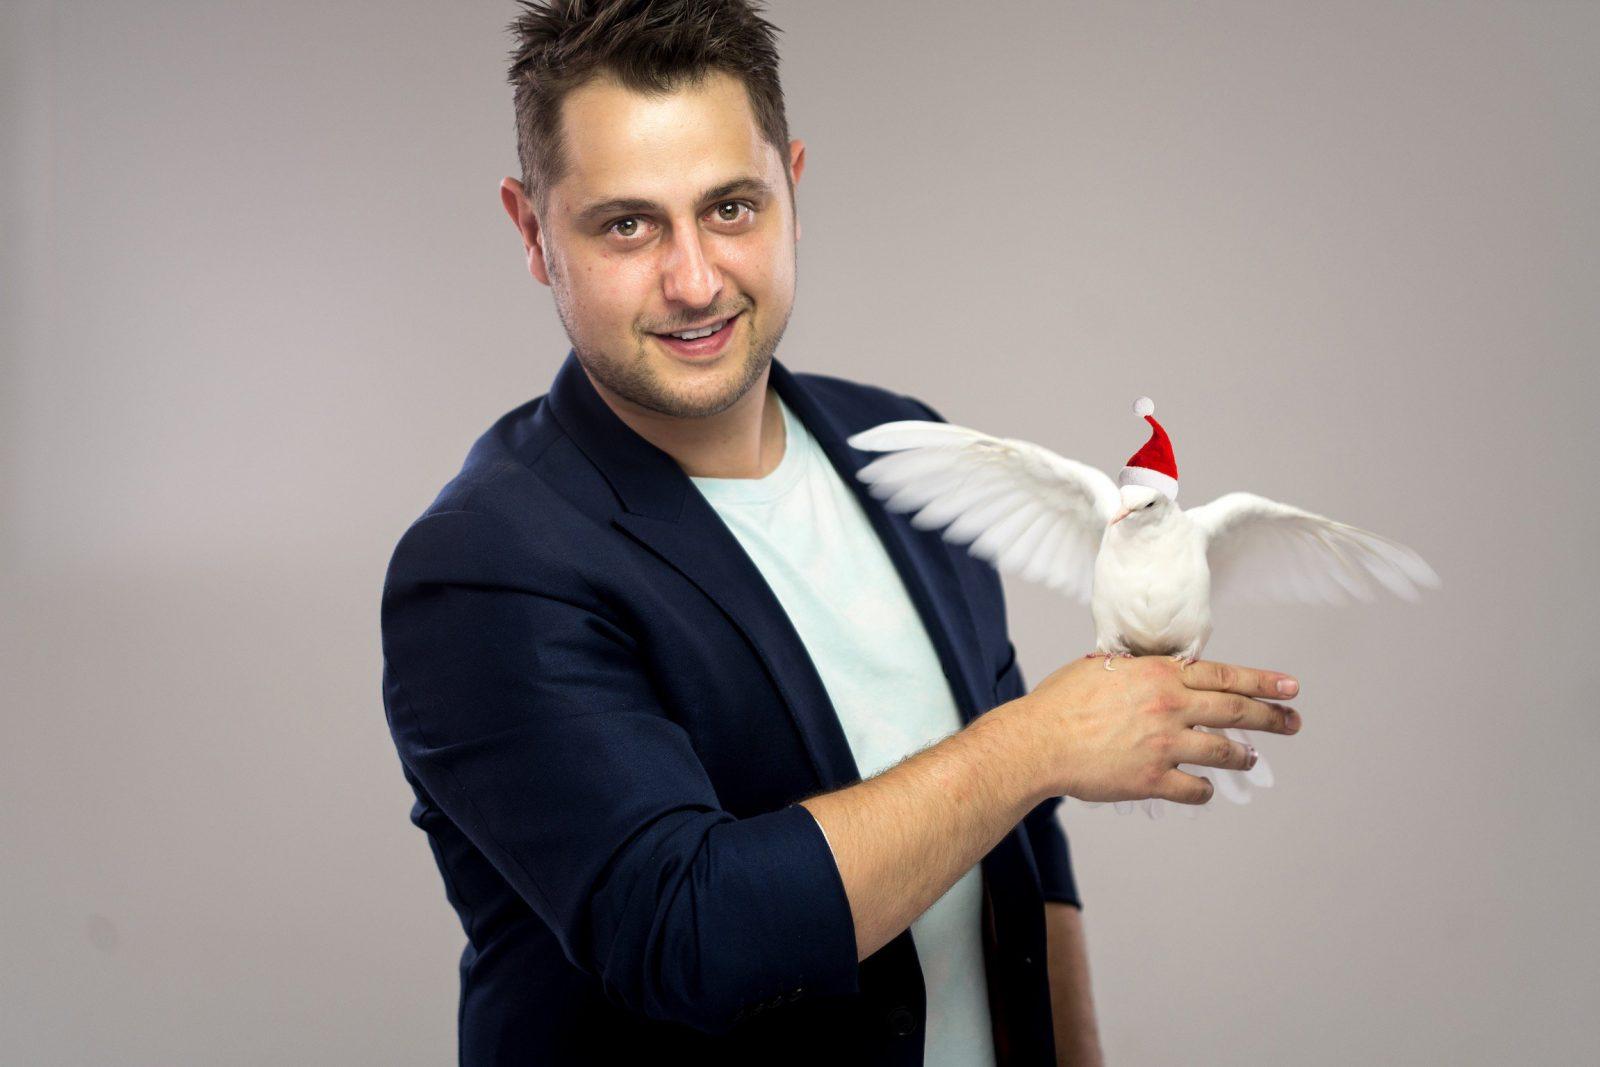 Michael Headshot with Dove